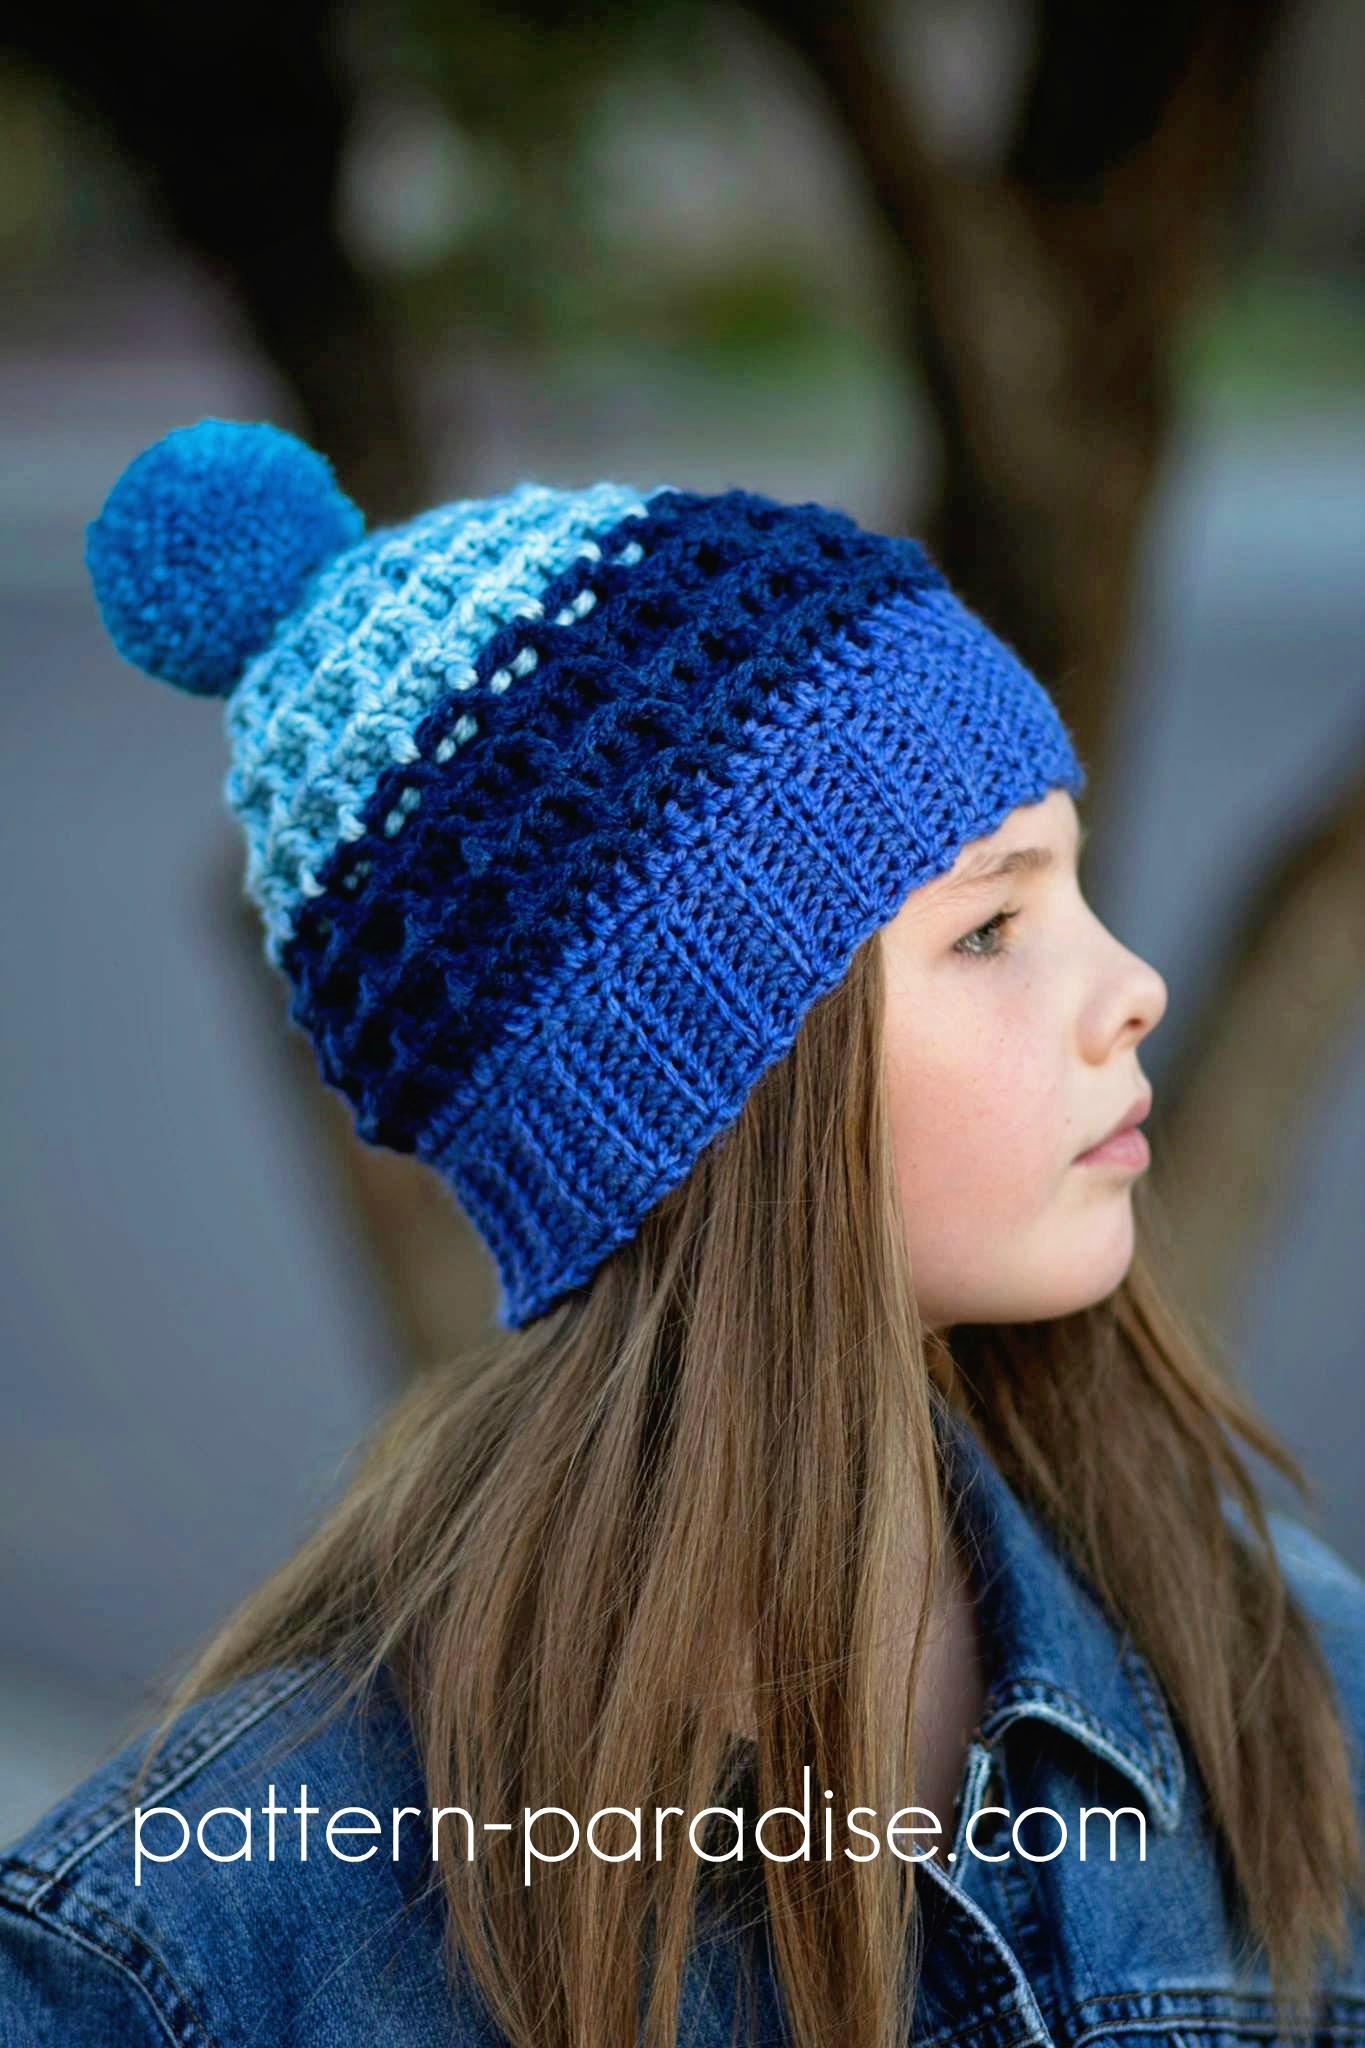 Free crochet pattern alpine nights beanie pattern paradise bankloansurffo Image collections